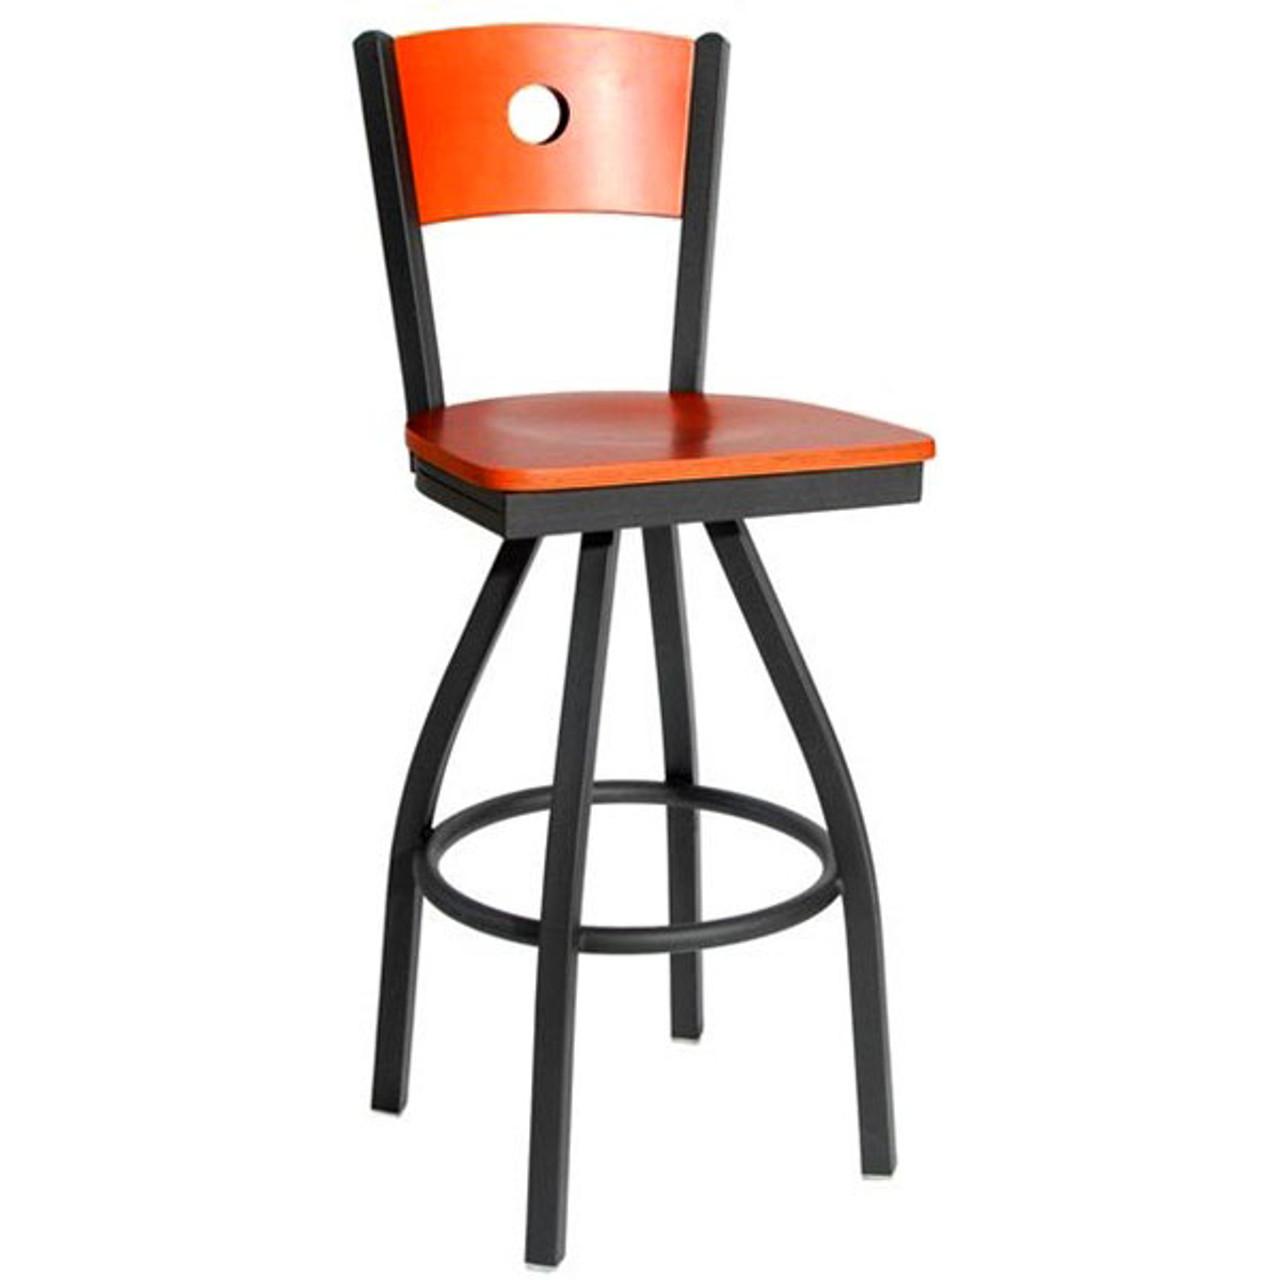 Cool Bfm Seating Darby Metal Circle Wood Back And Seat Restaurant Swivel Bar Stool 2152Sw Sb Bfms Creativecarmelina Interior Chair Design Creativecarmelinacom